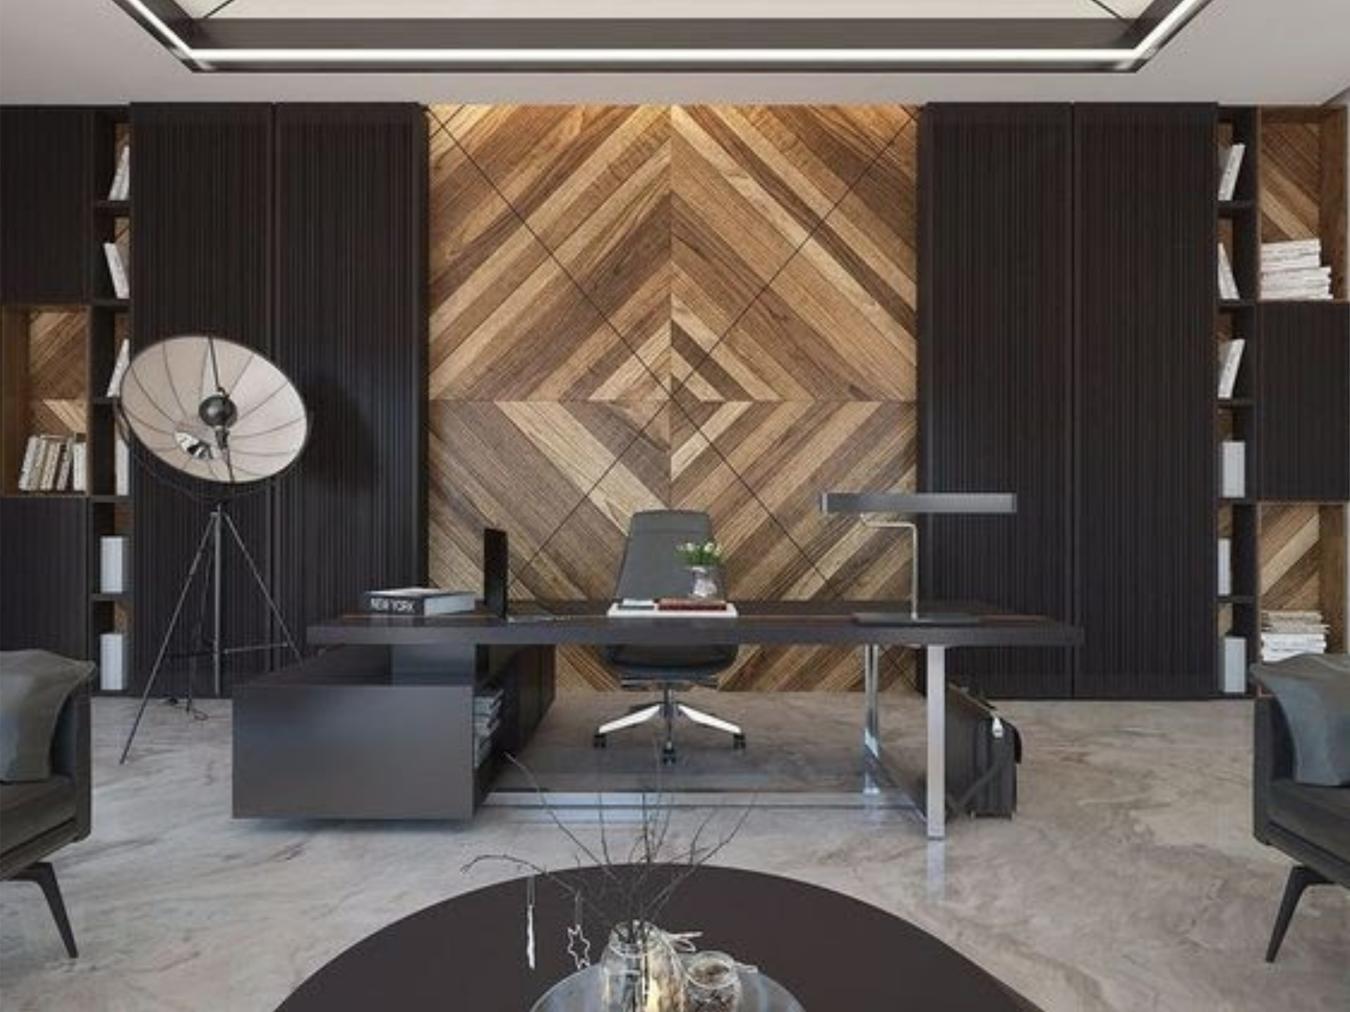 Statement wall - office interior design inspiration